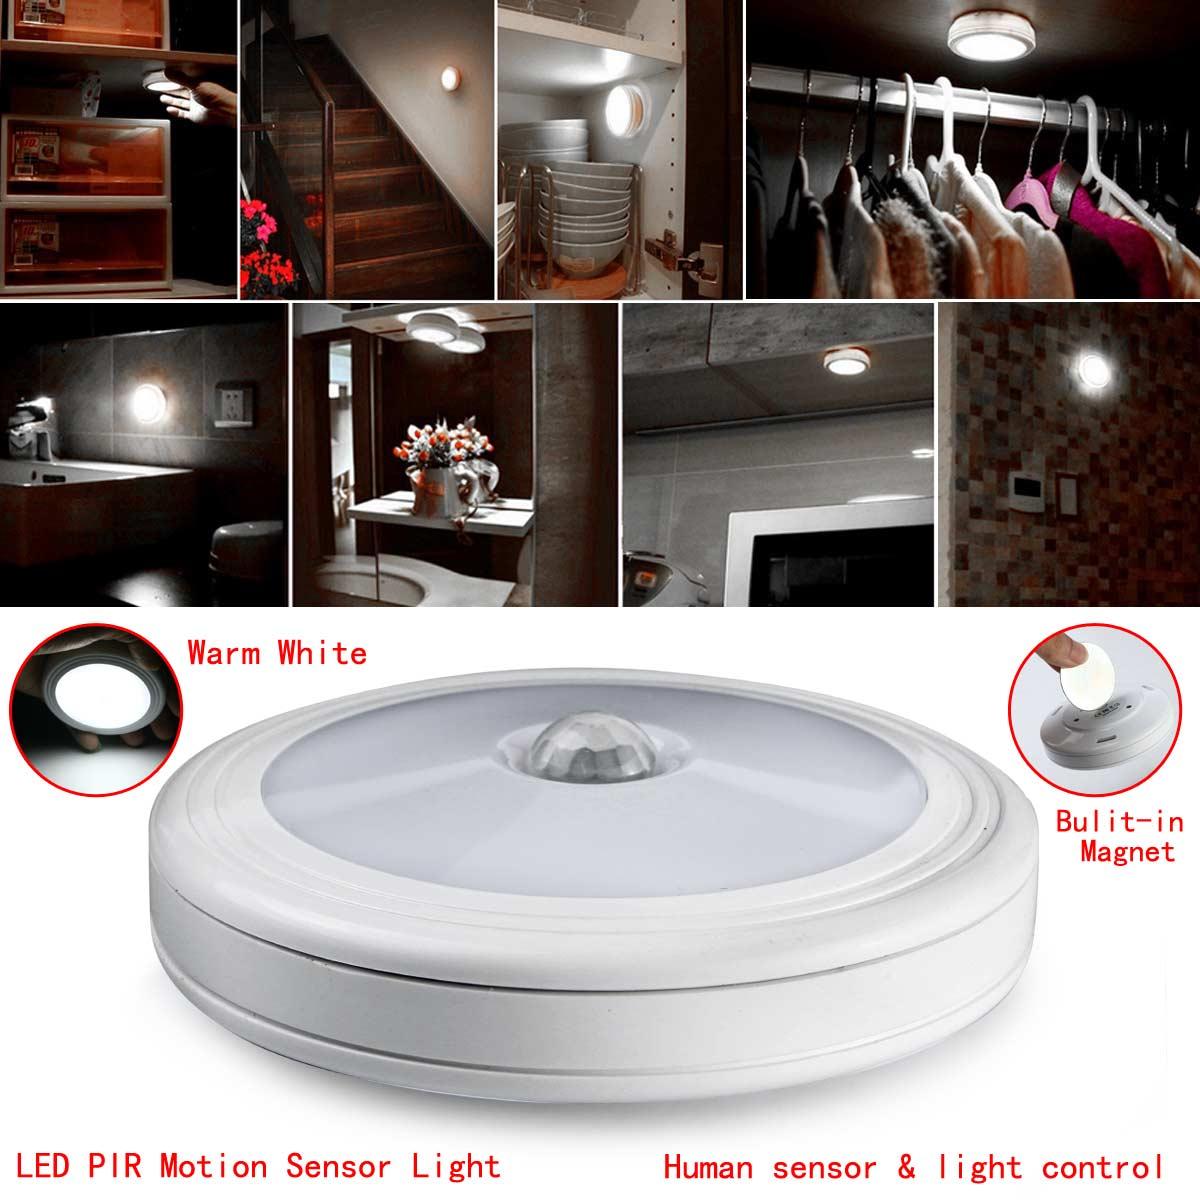 Led night light warm white - Hot Magnetic Motion Sensor Led Night Light Battery Powered 6 Led Pir Closet Hallways Wall Lamp